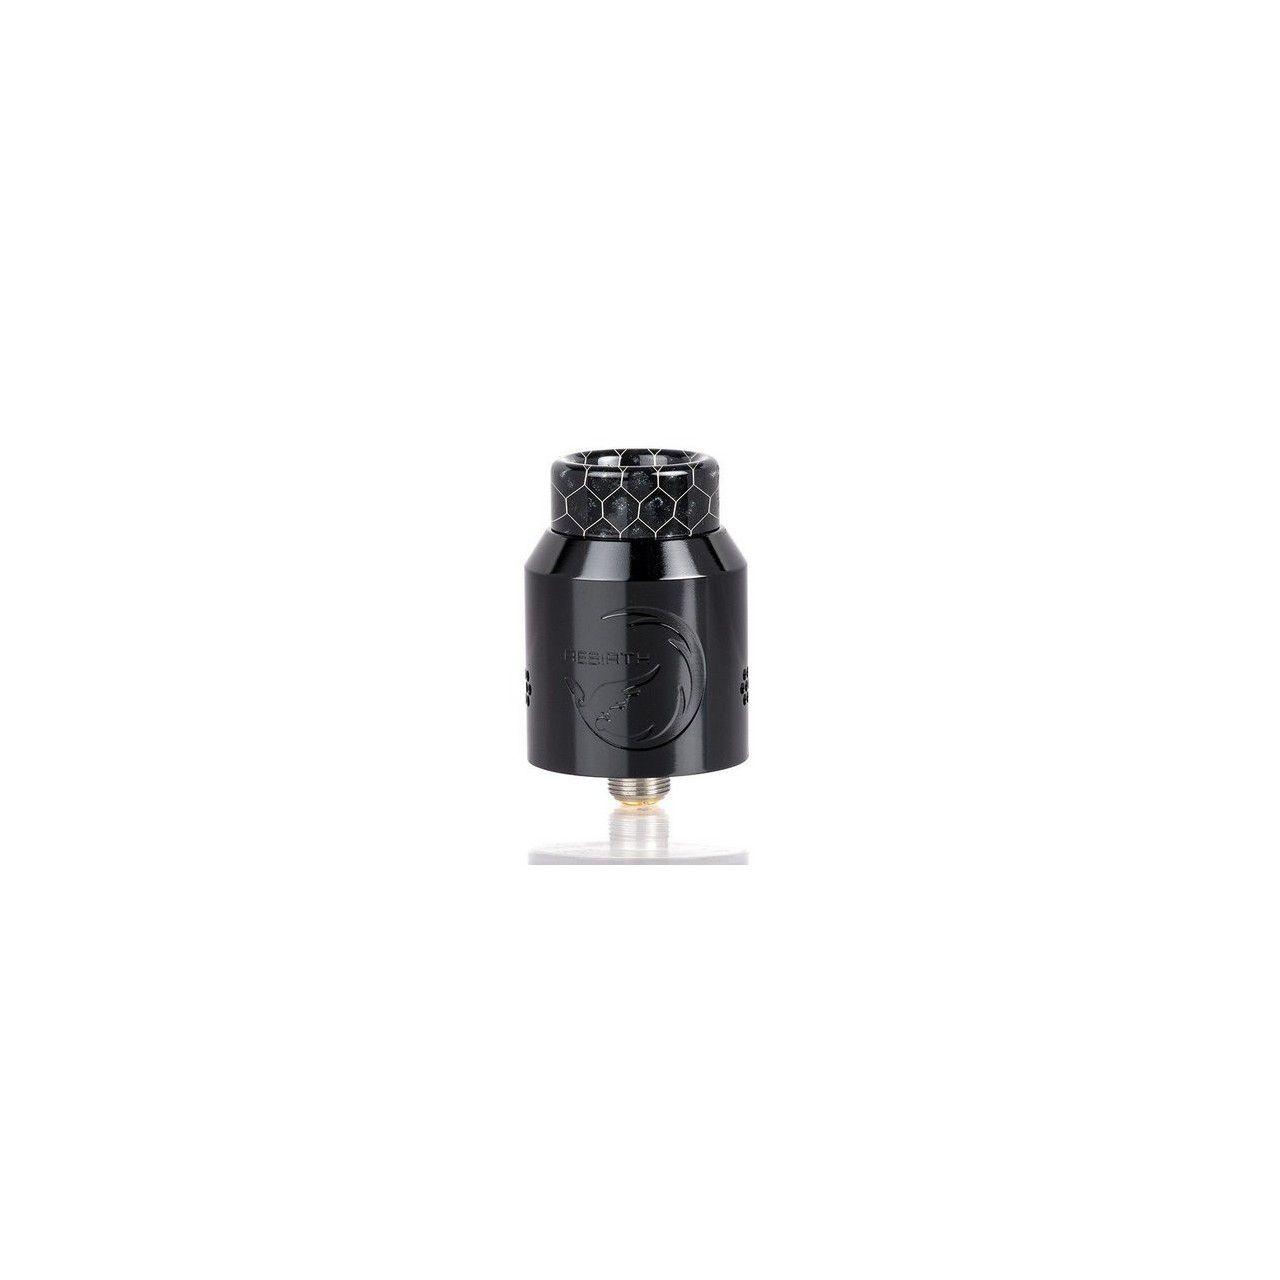 Atomizador Hellvape Rebirth RDA 24mm